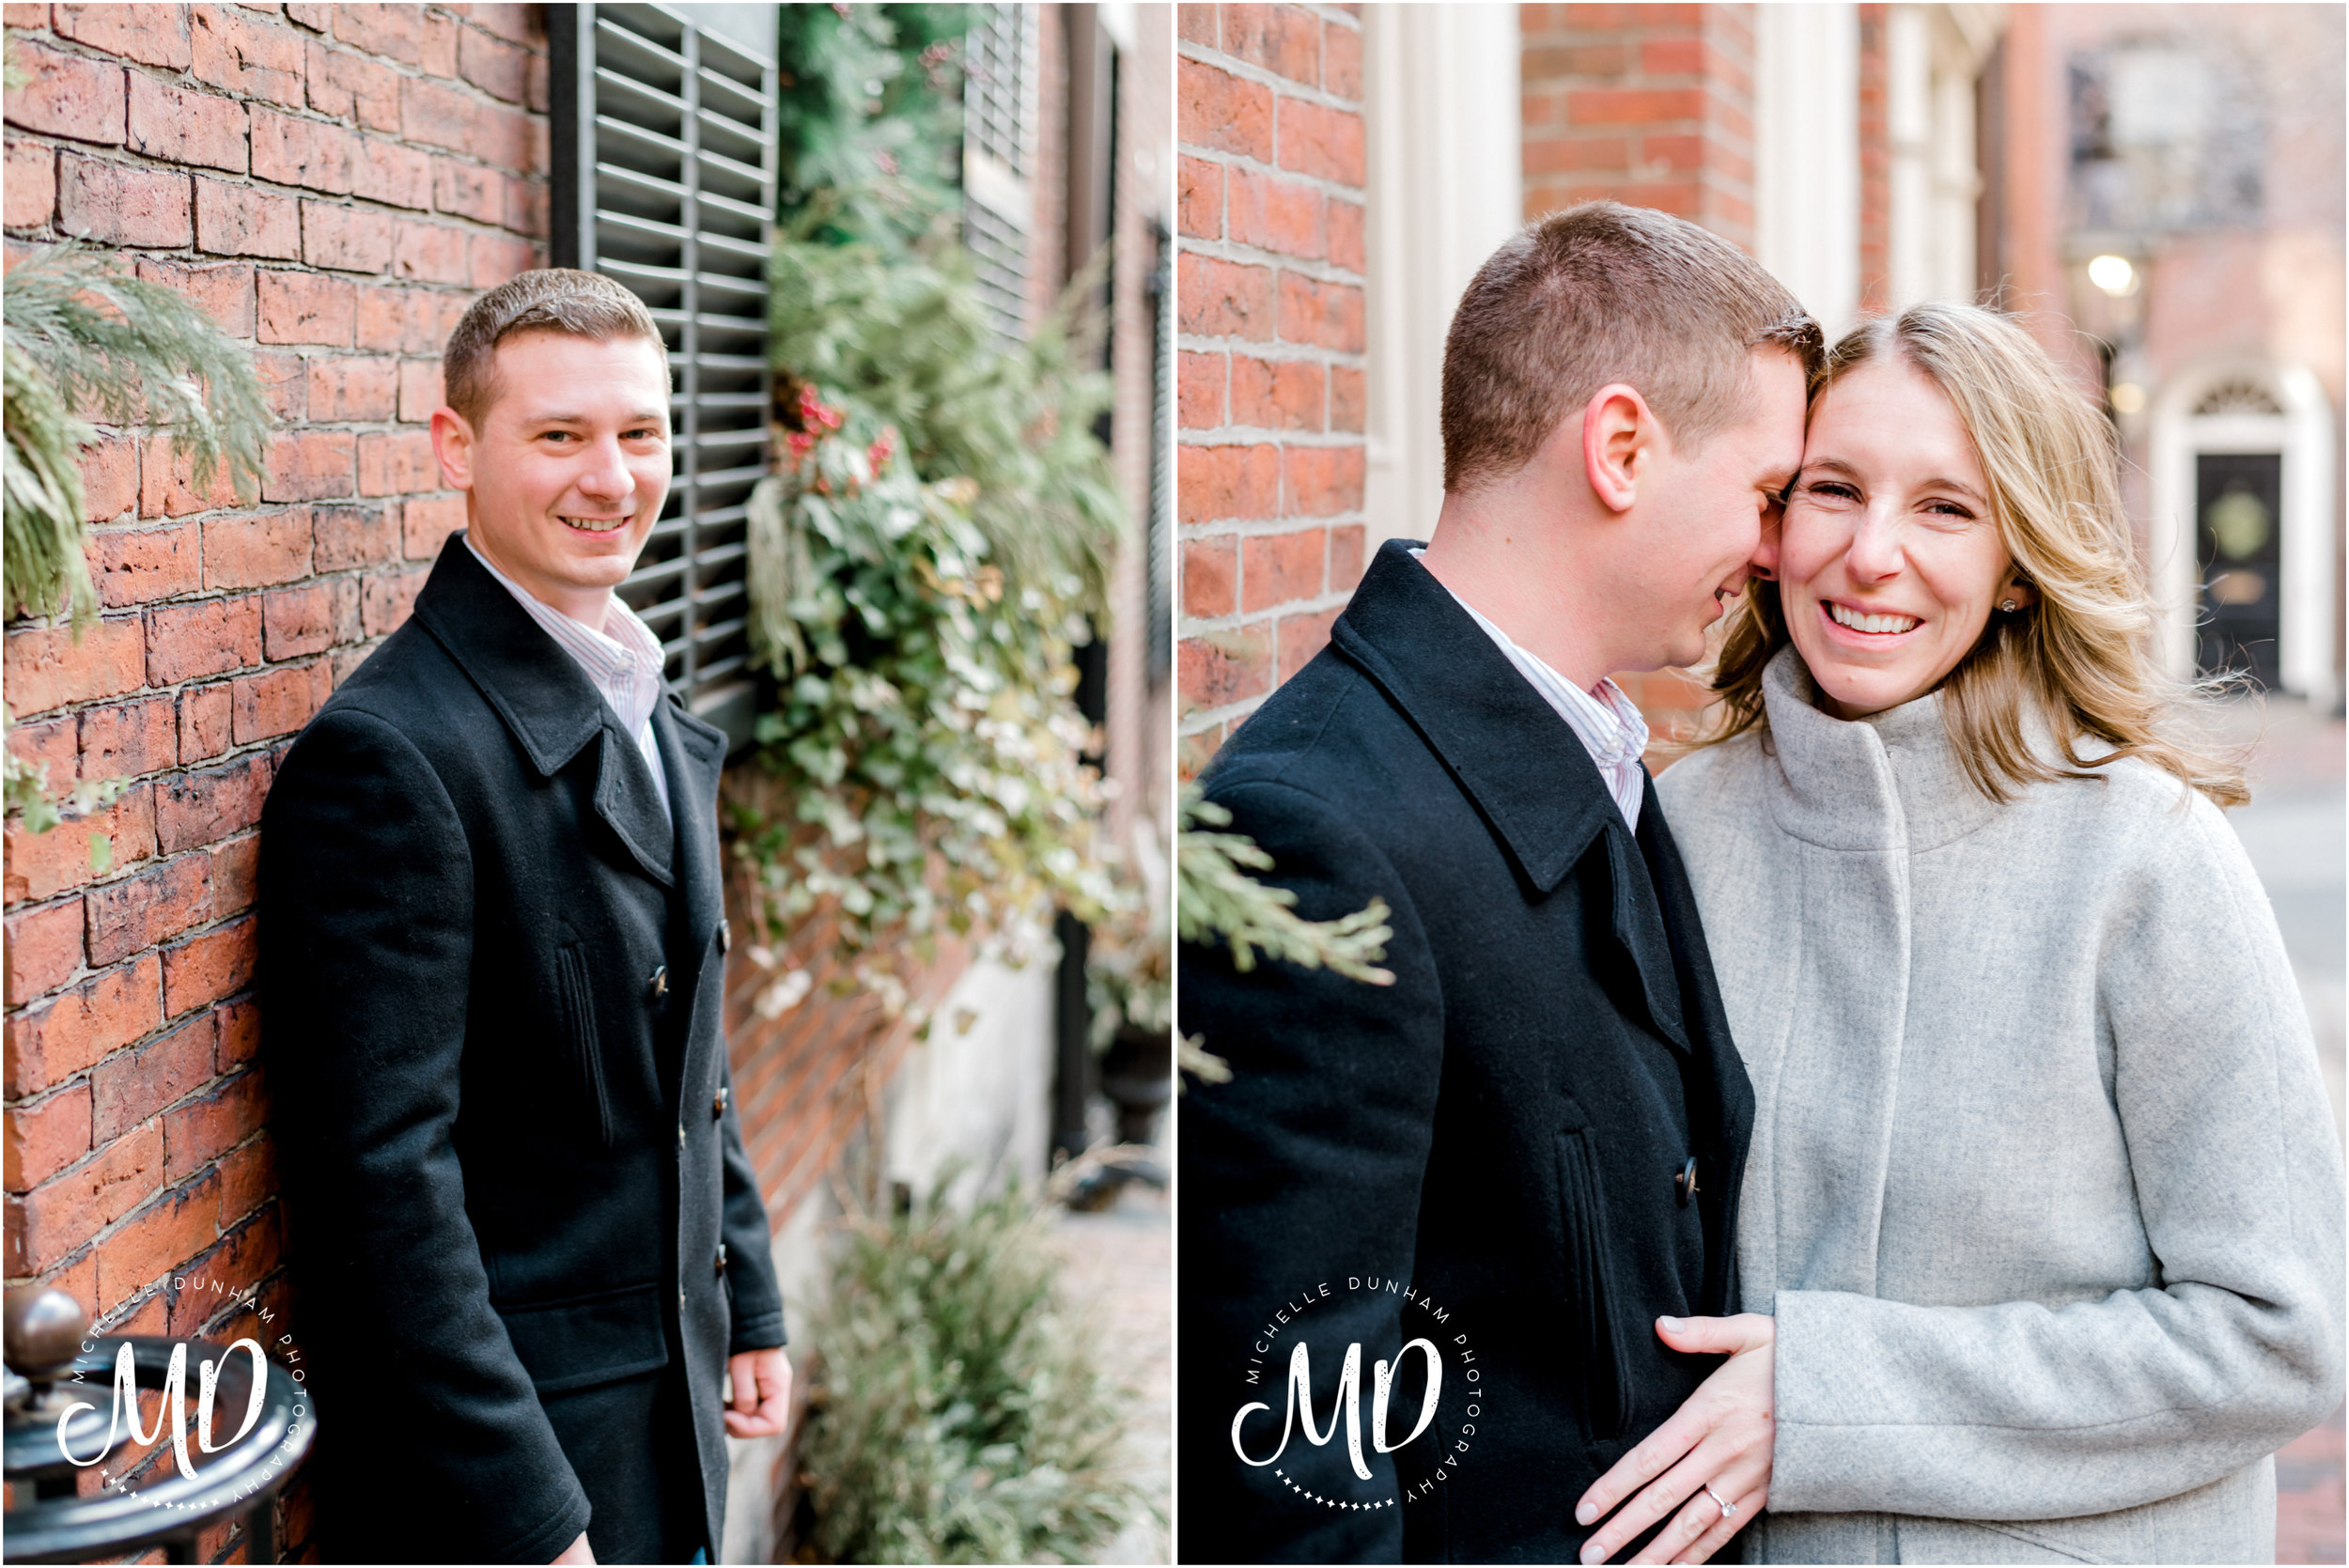 Michelle-Dunham-Photography-Beacon-Hill-Engagement-6.jpg